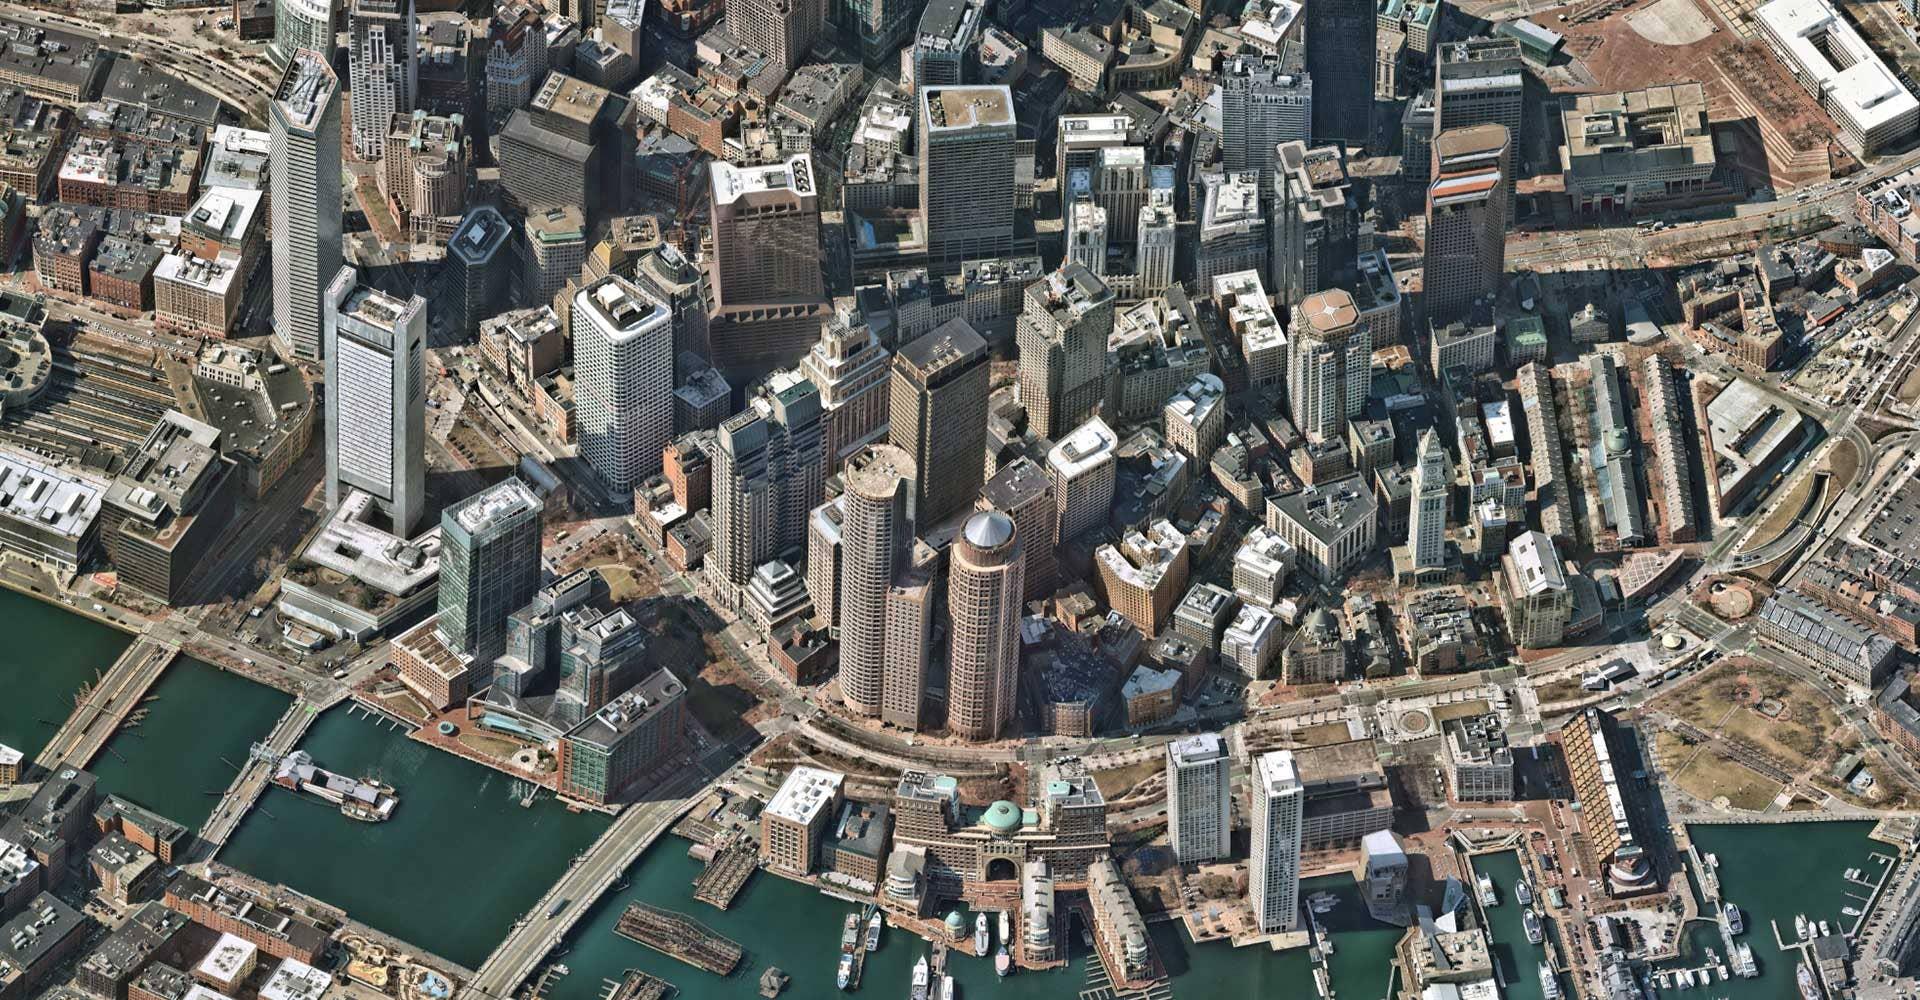 Boston, Massachusetts downtown high resolution aerial image